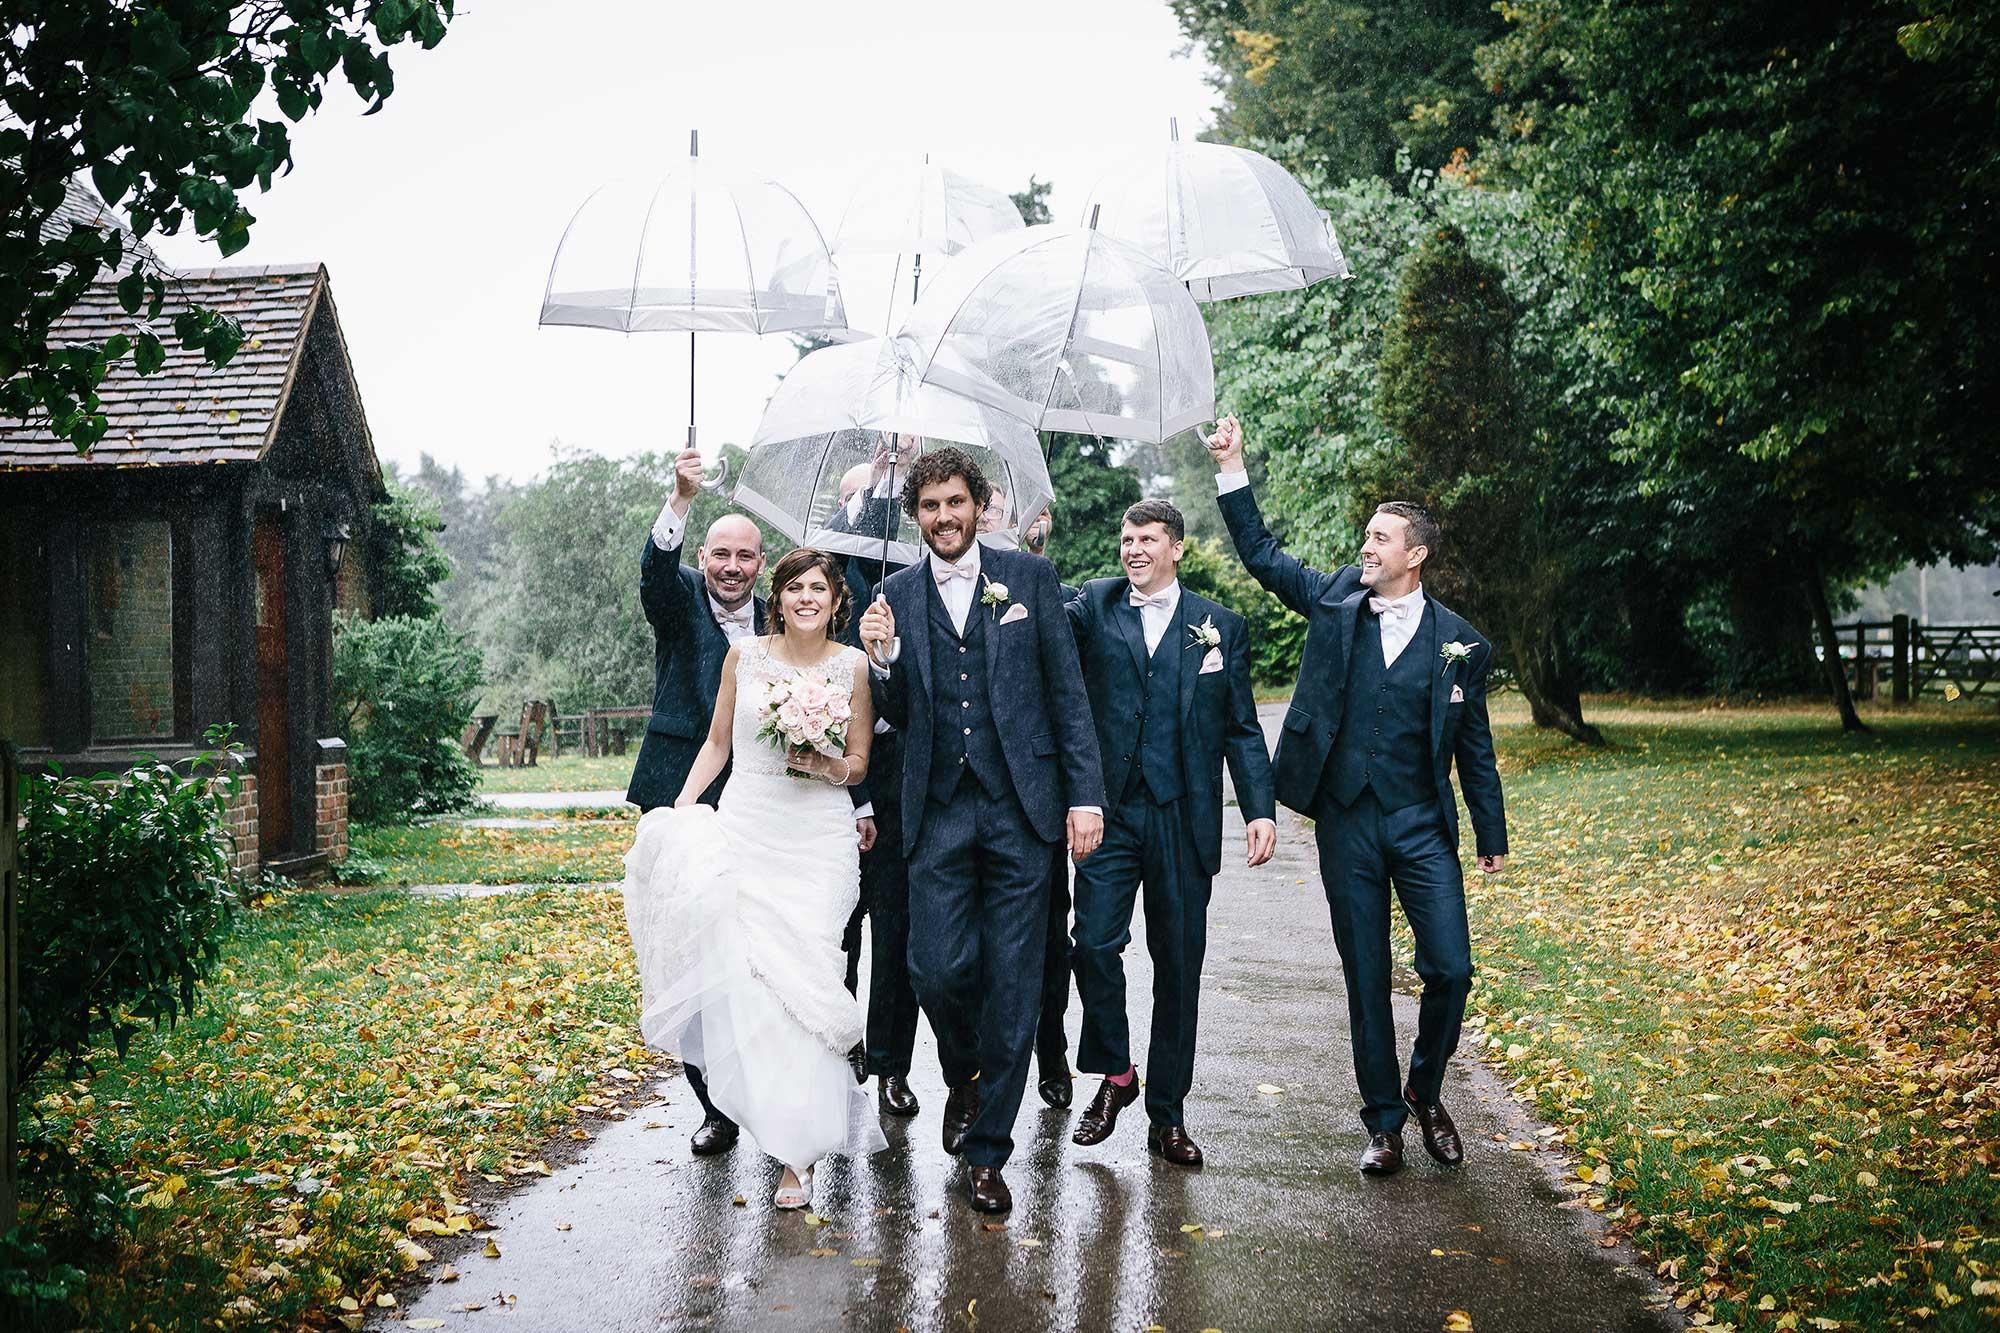 Rhea and Doms wedding at Herons farm